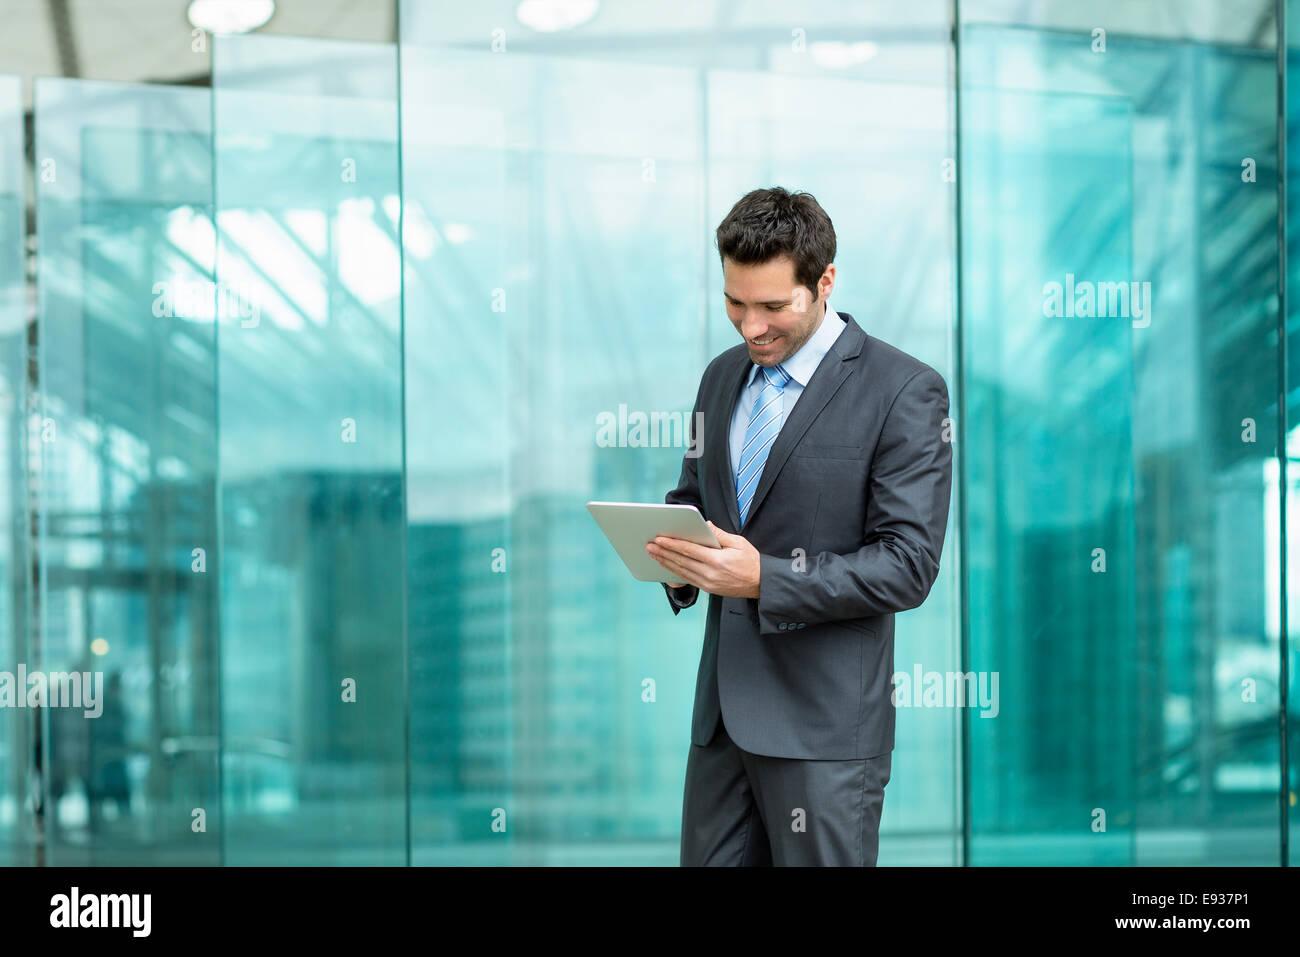 Businessman using a Digital Tablet Photo Stock